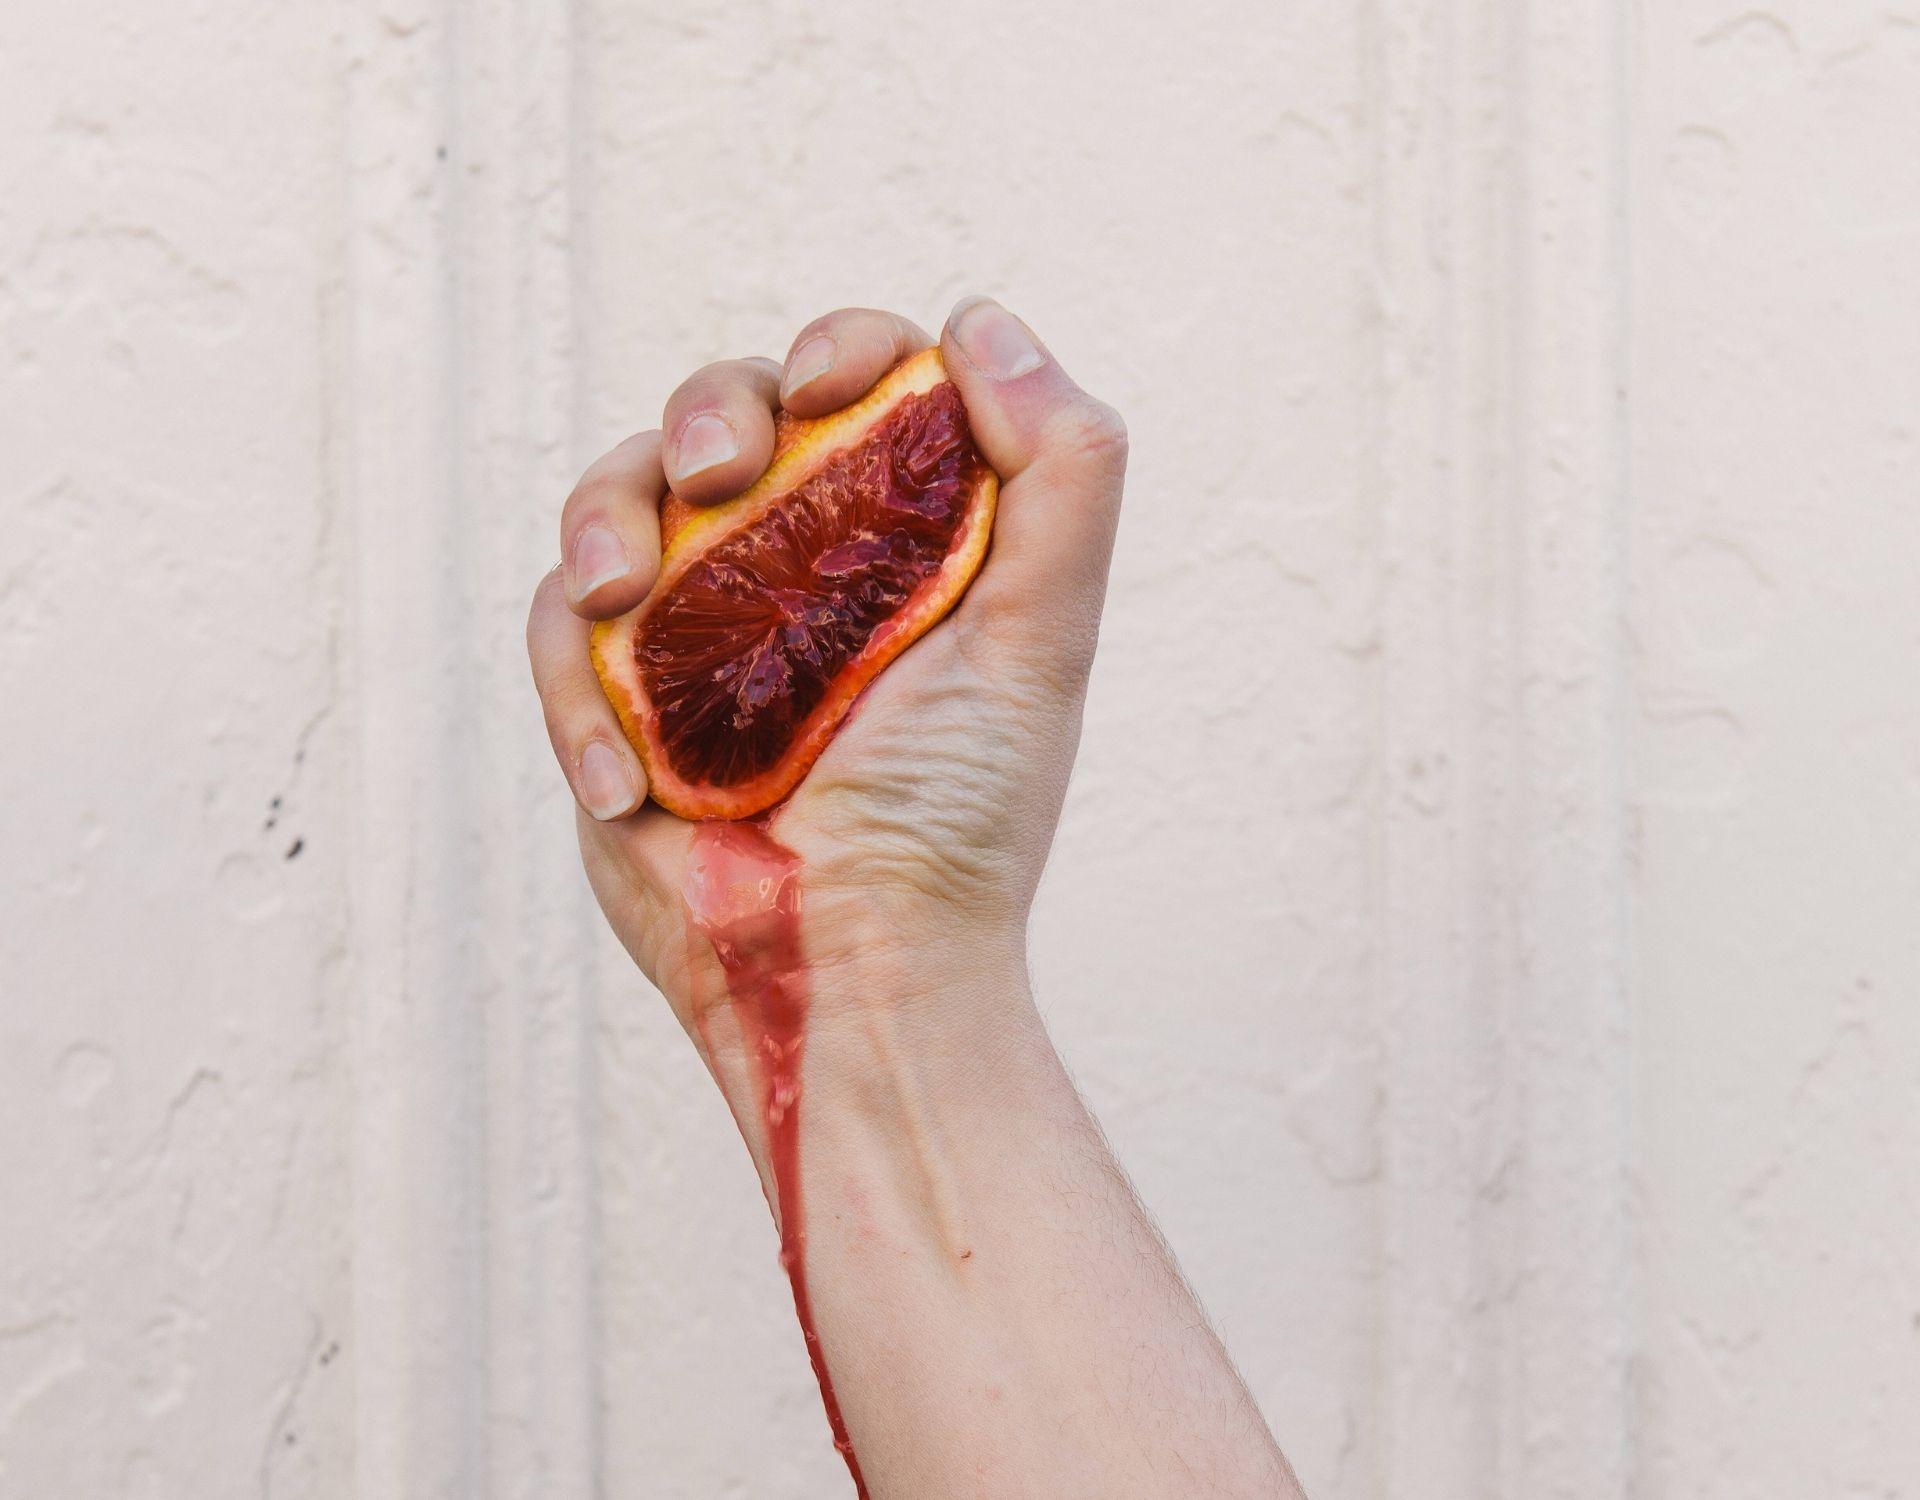 Blut Sex